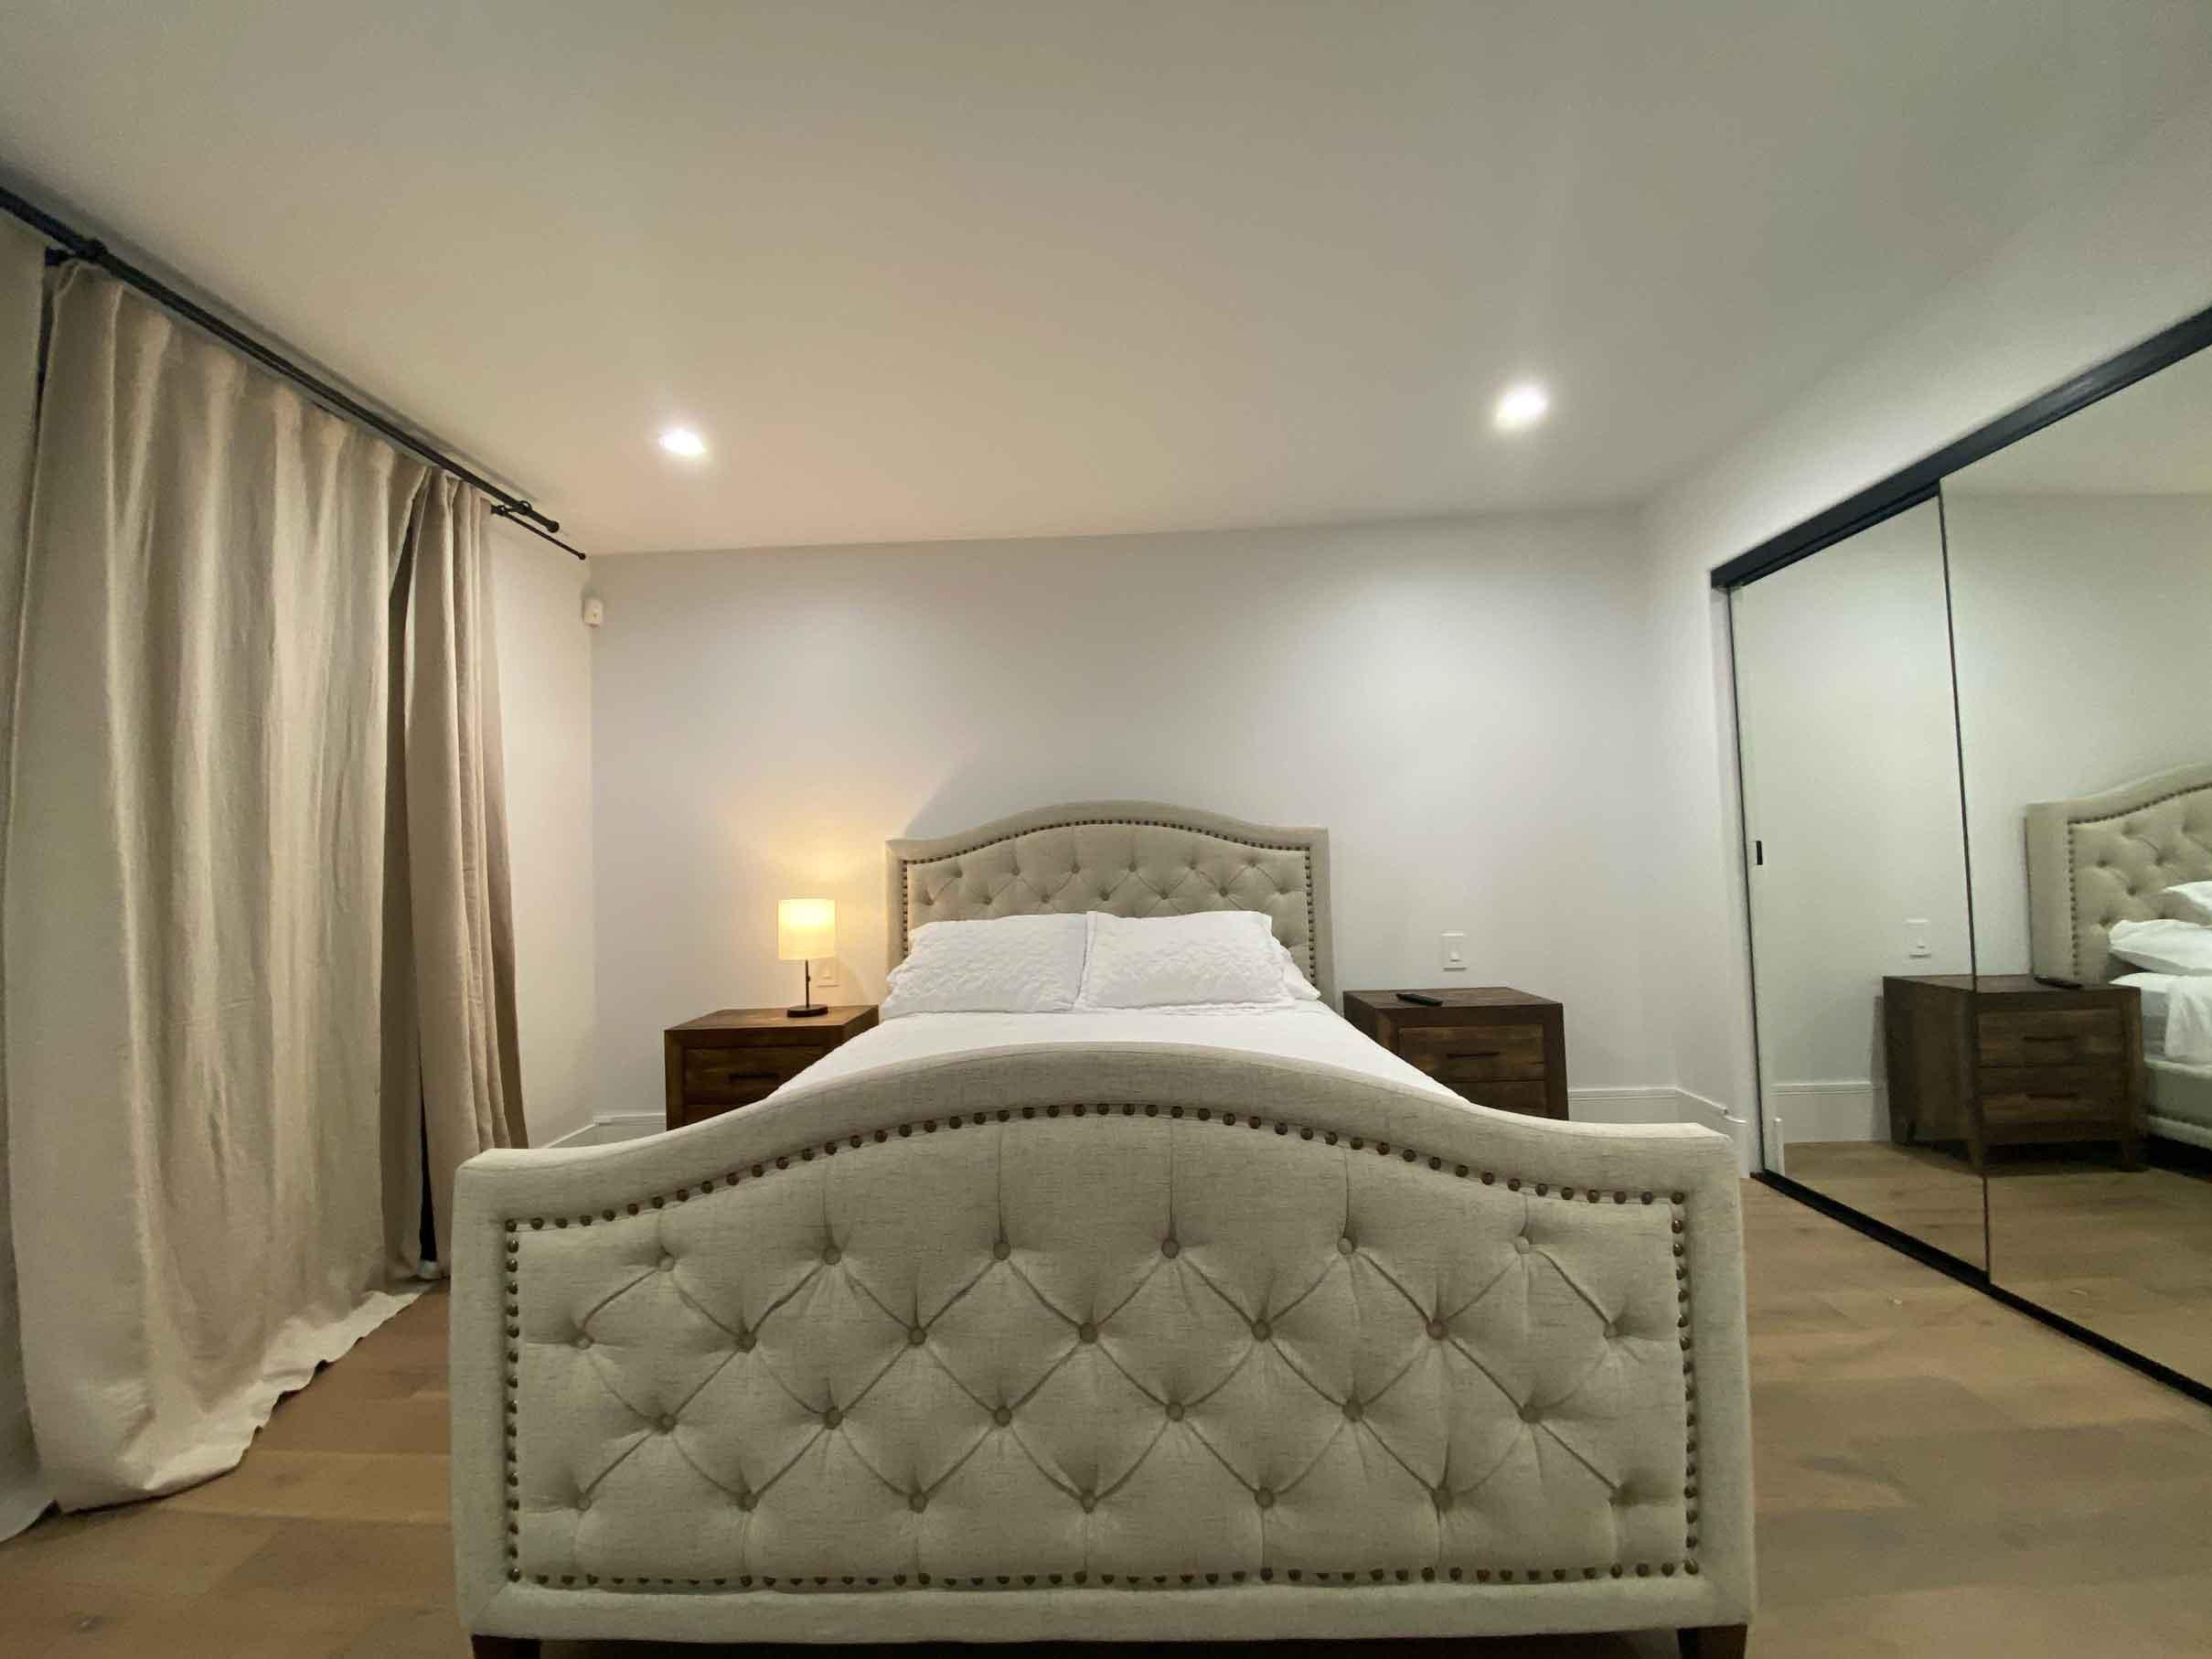 Private-room-California-rehab